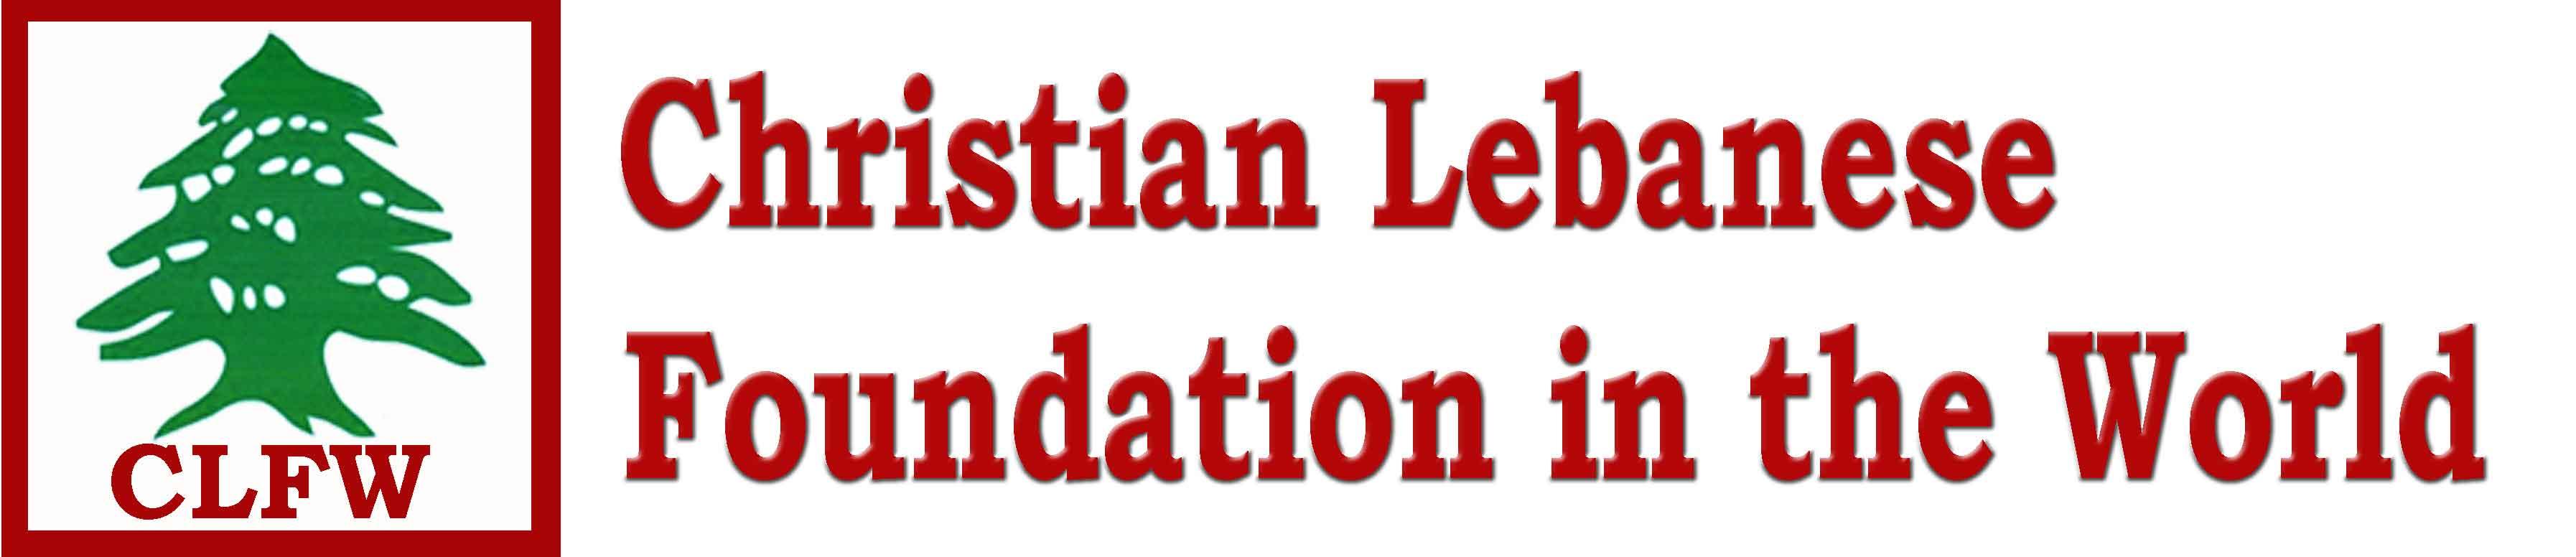 CLFW-Logo-March2015-2